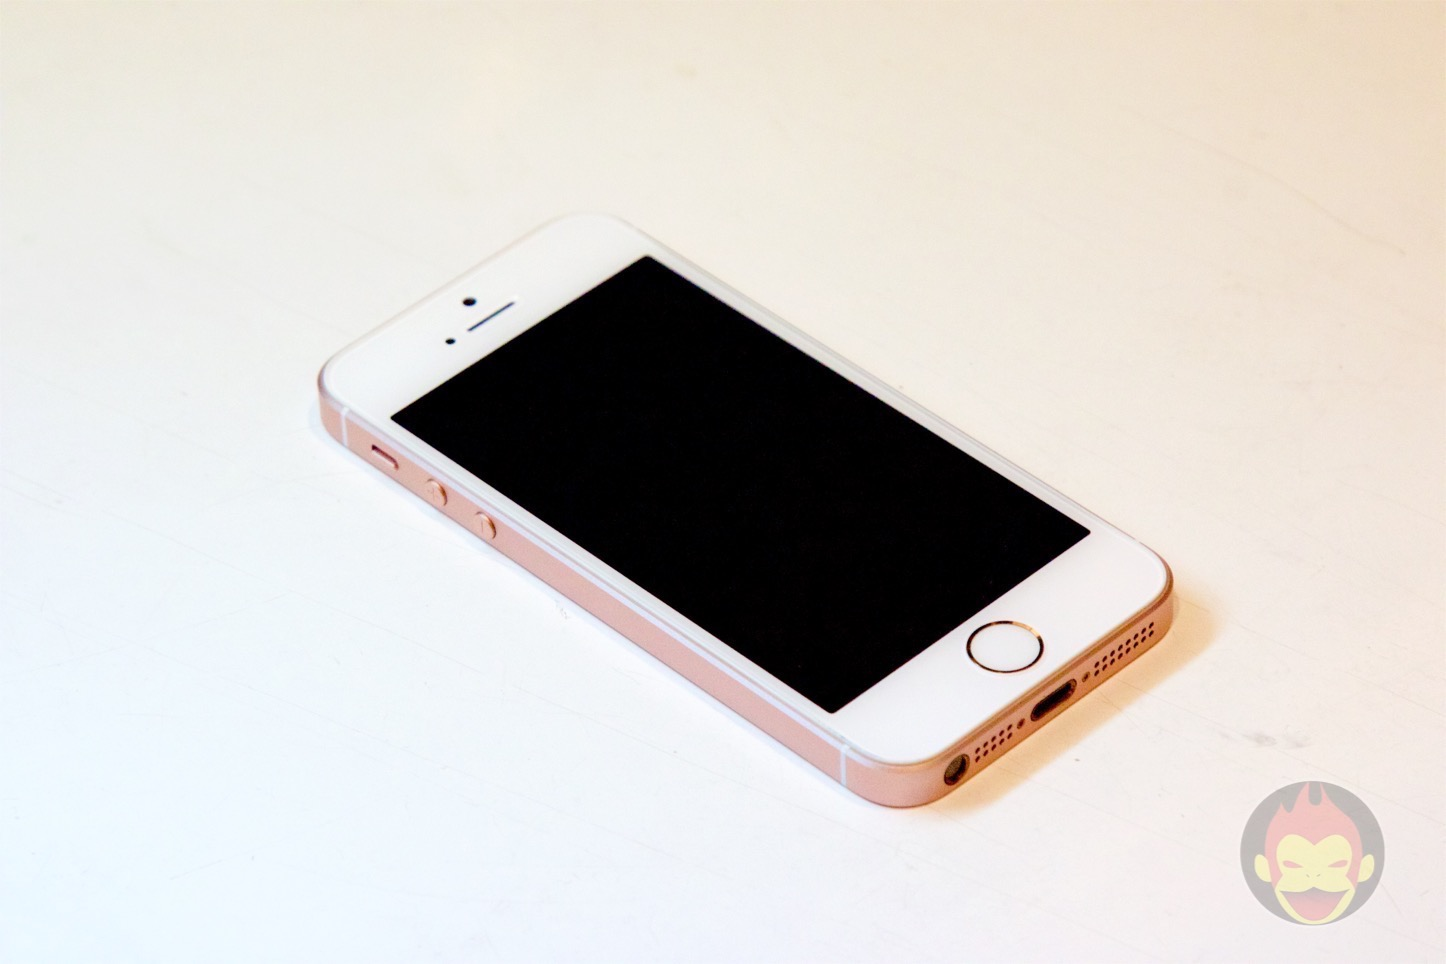 iPhone-SE-decompose-01.jpg